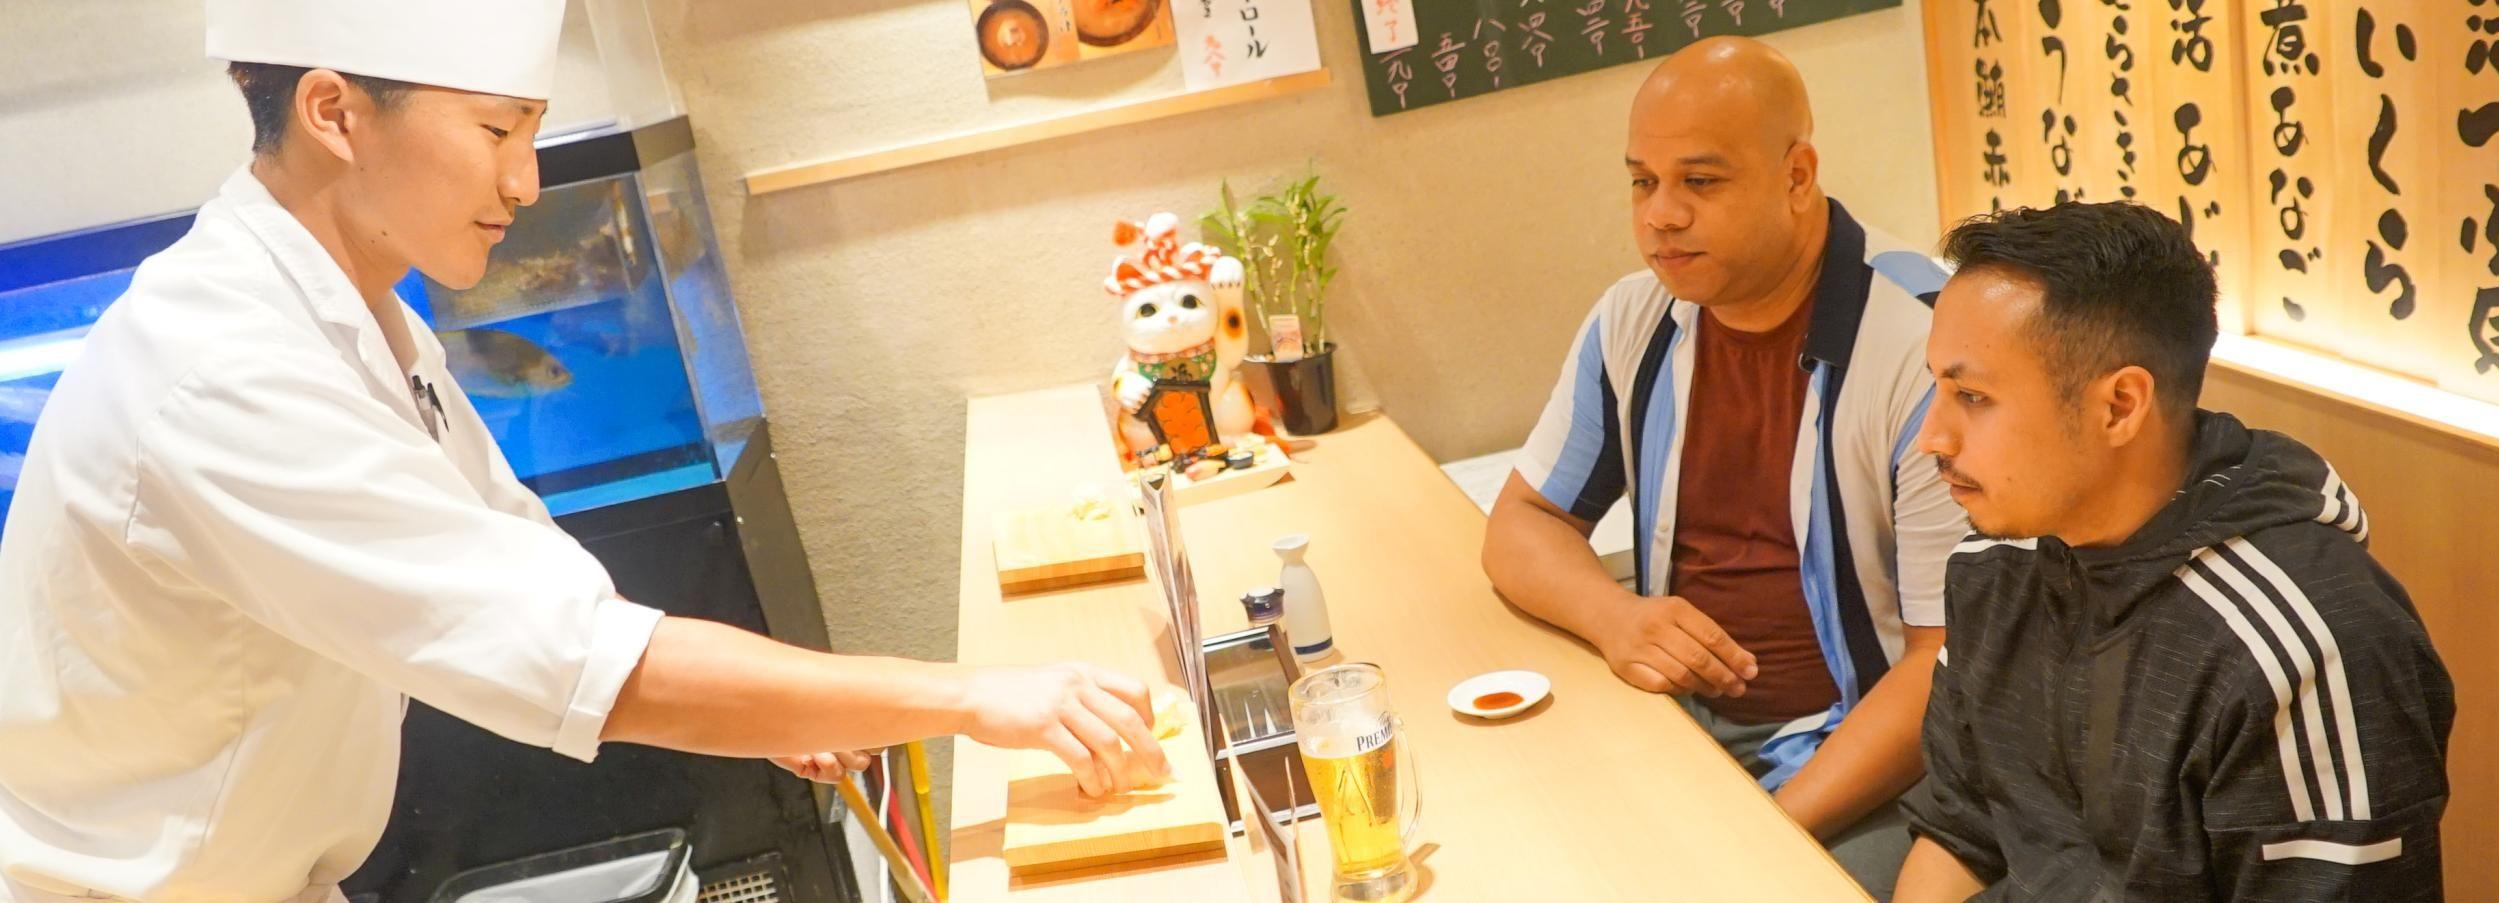 Tokio: tour gastronómico nocturno en Shinjuku